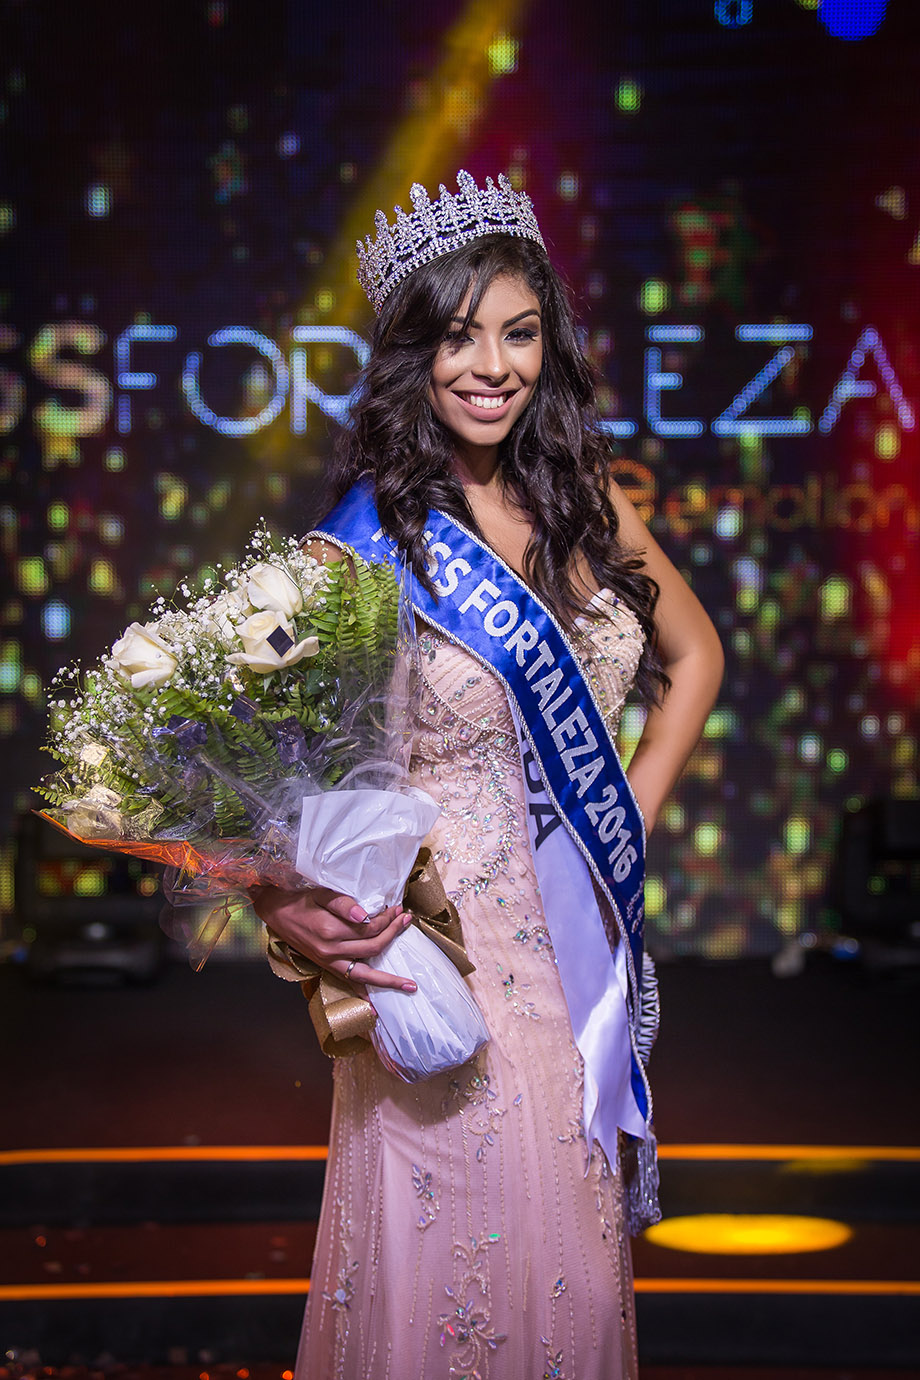 Blog Cris Moreira - Miss Fortaleza 2016 - 8